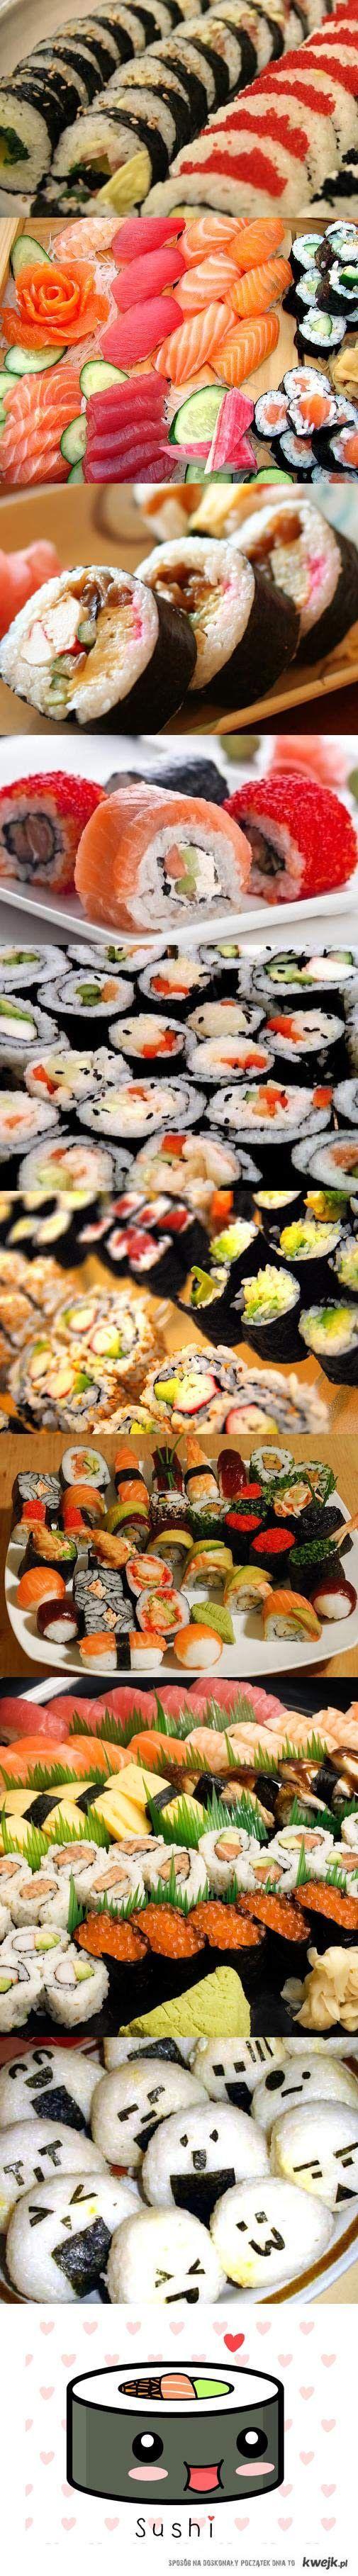 Sushi forever <3